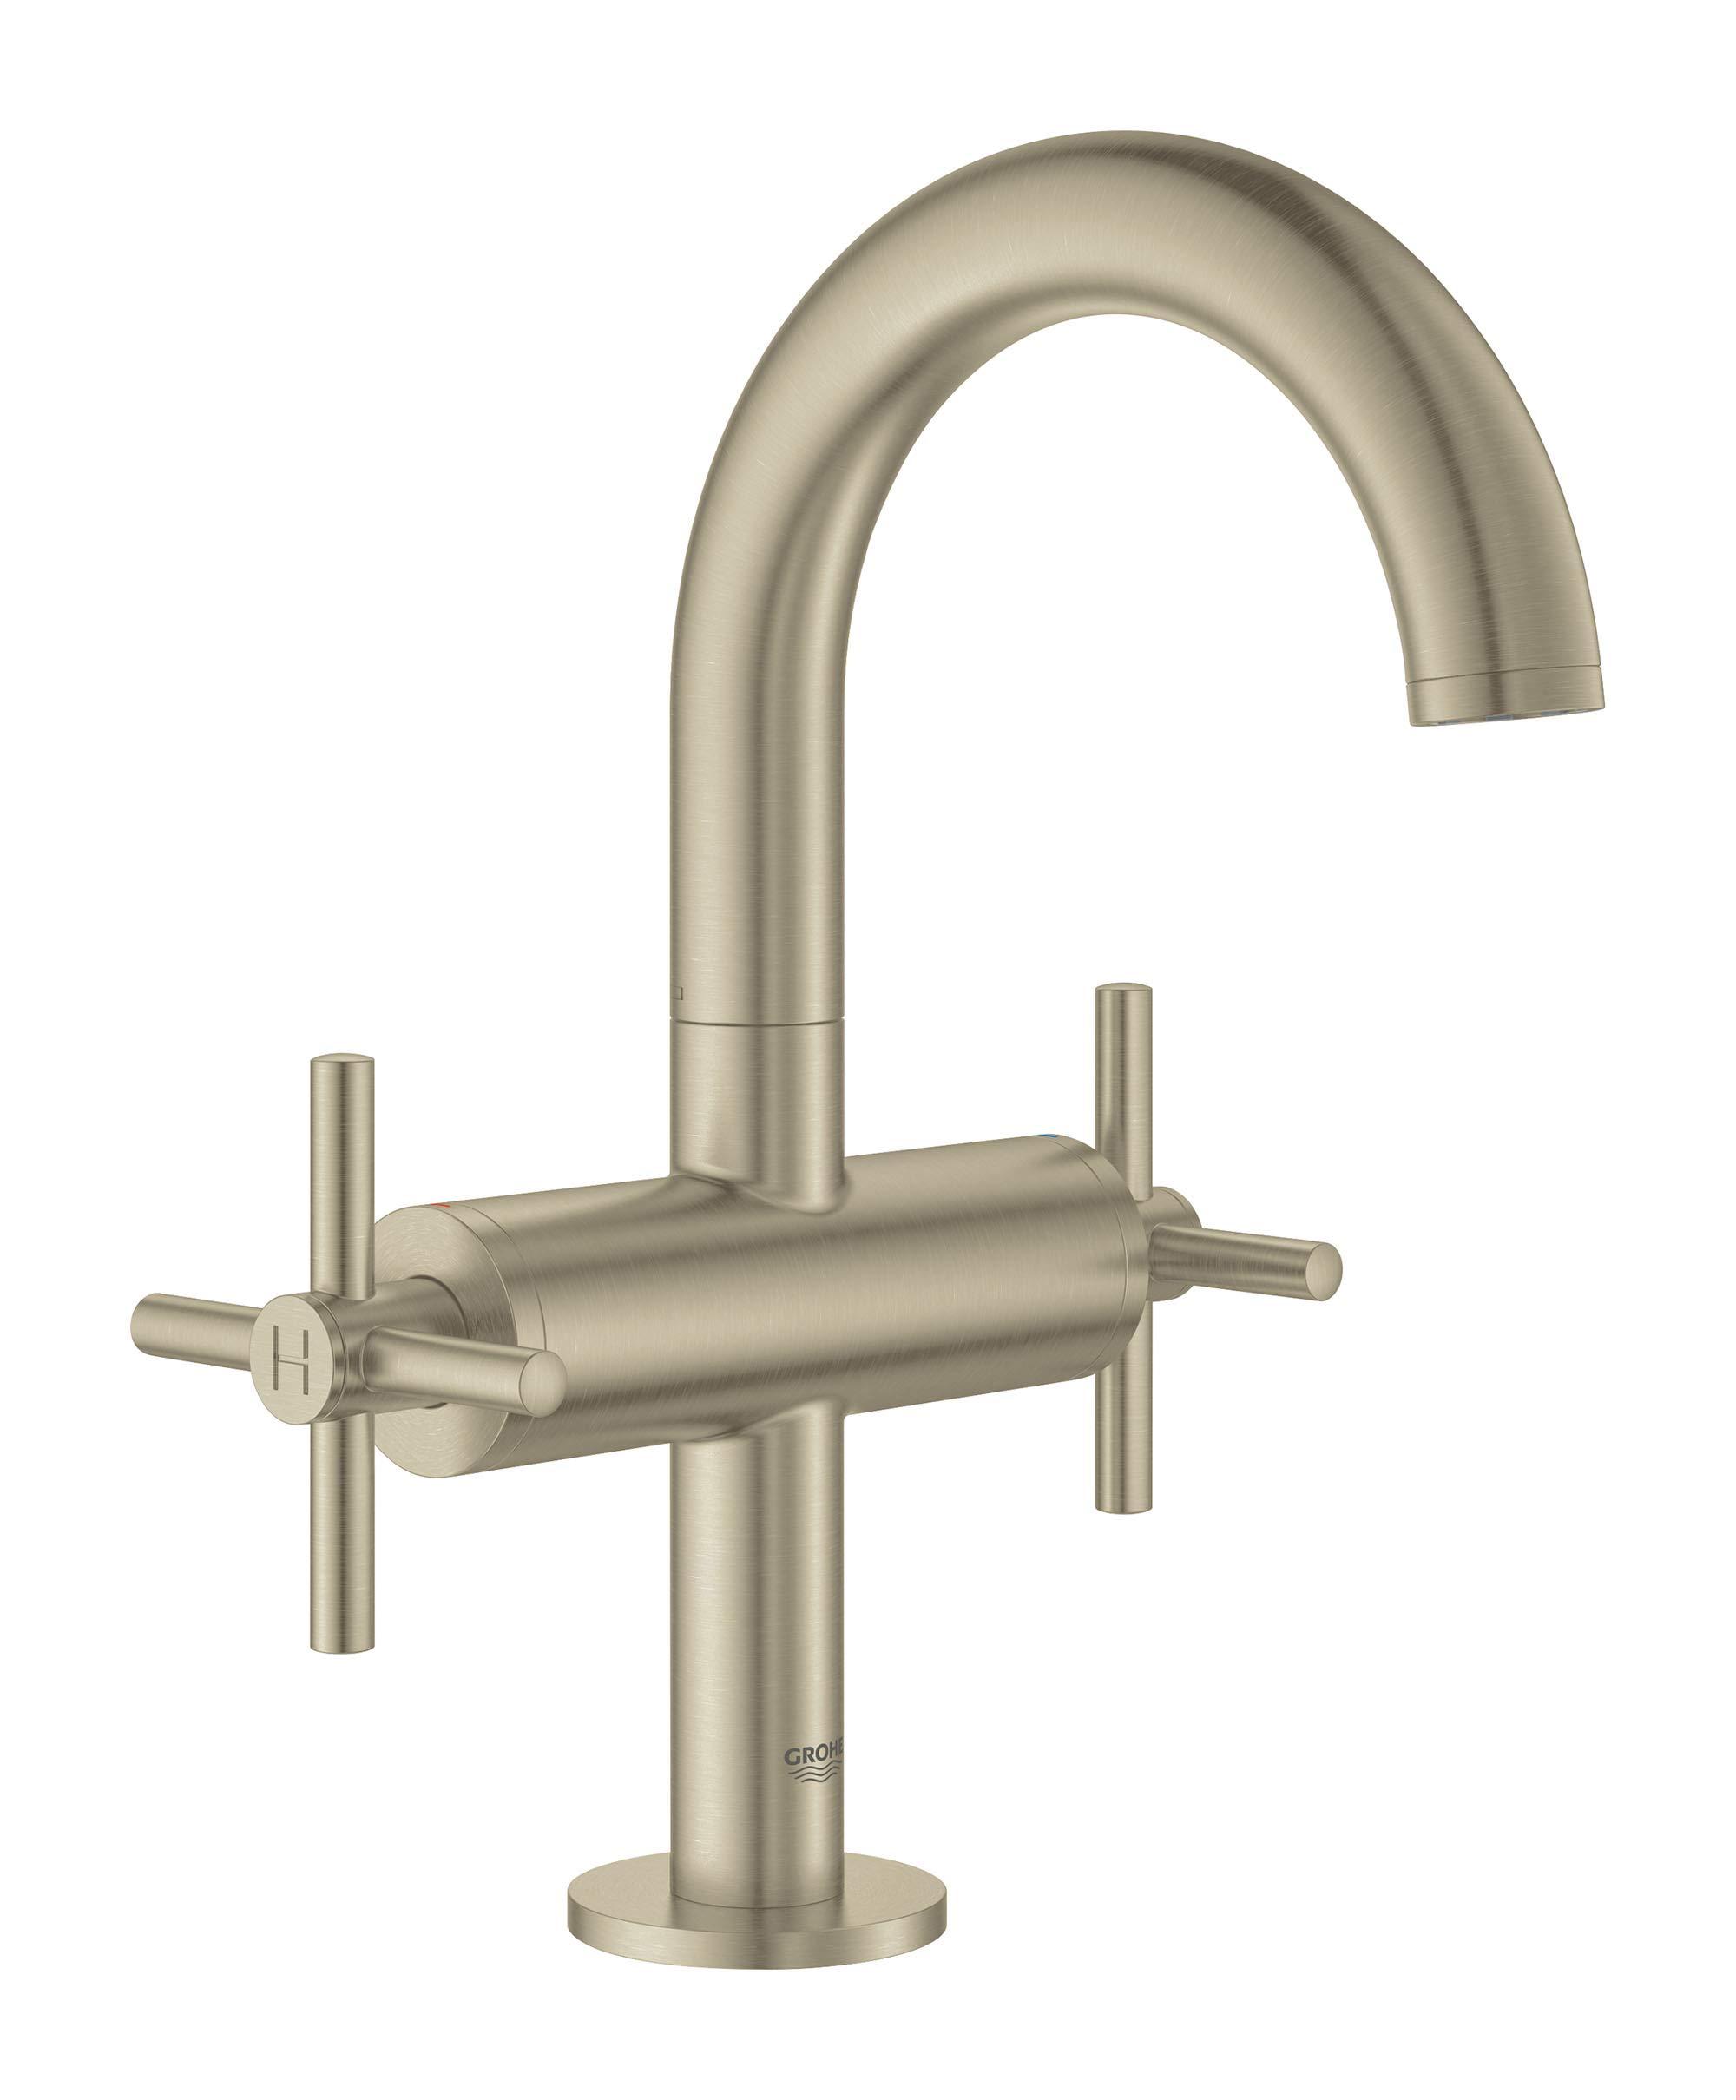 Grohe 18026EN3 Atrio Bathroom Faucet Cross Handles, Brushed Nickel by GROHE (Image #4)